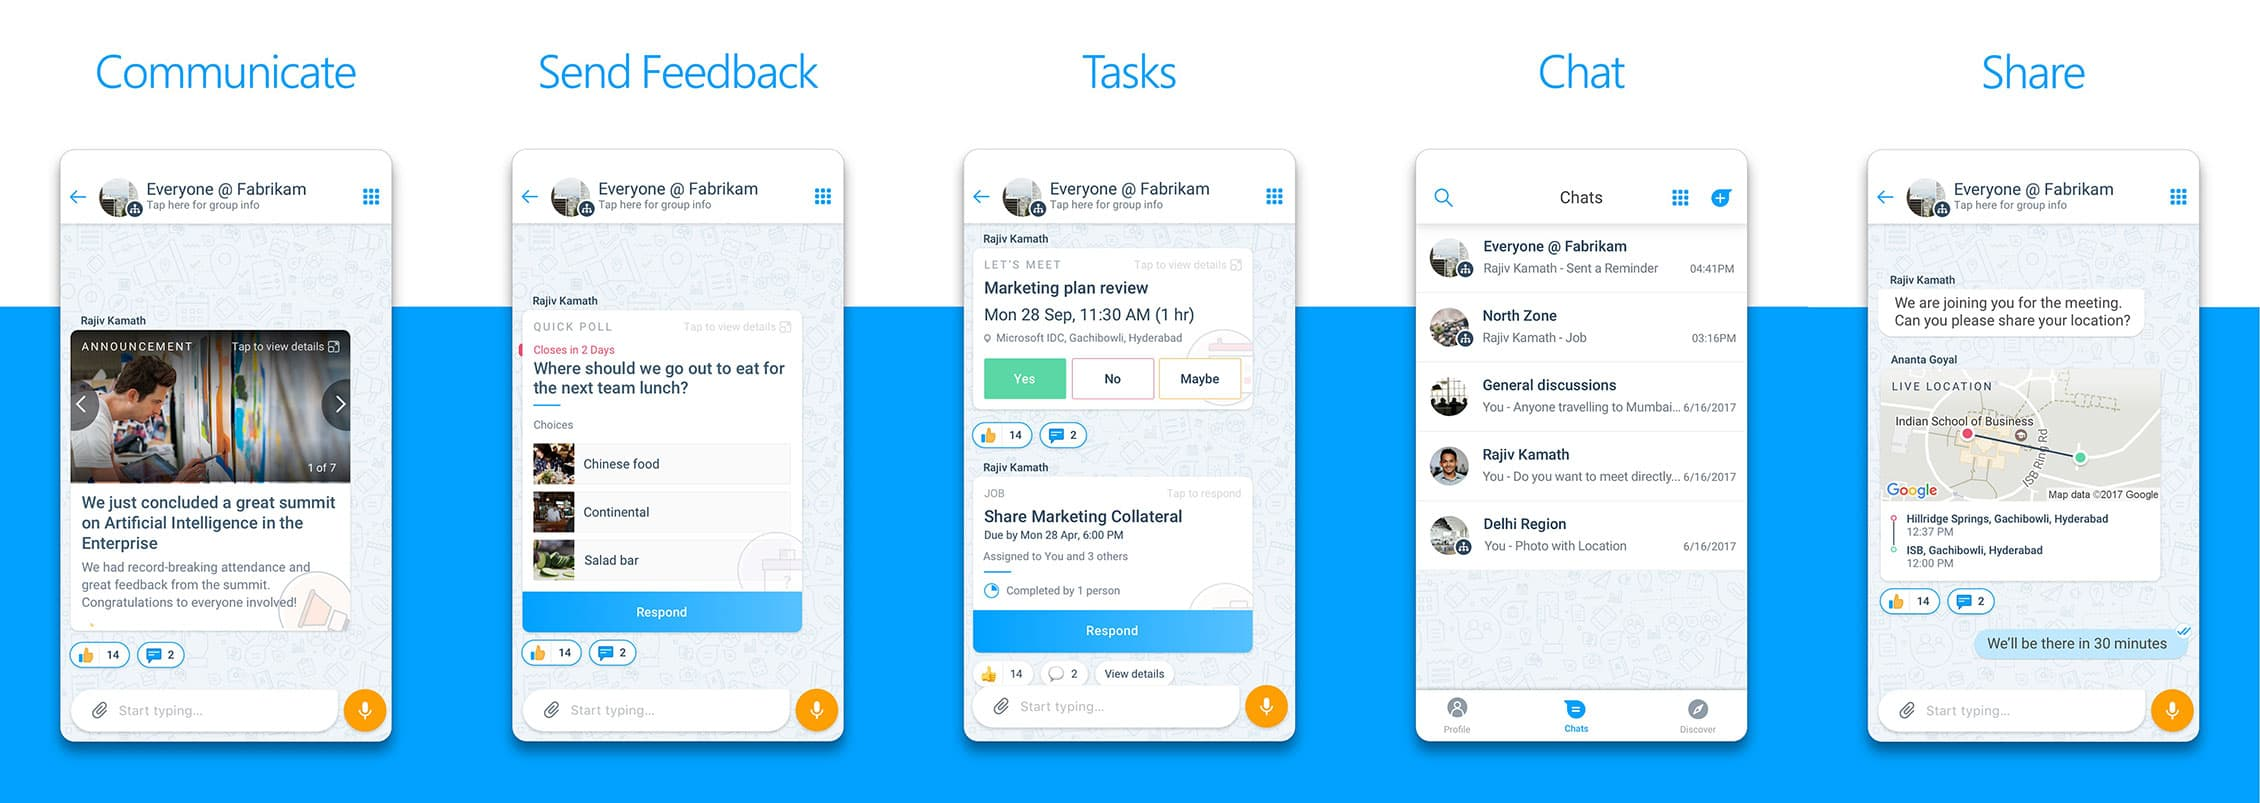 Microsoft Kaizala App Screenshots